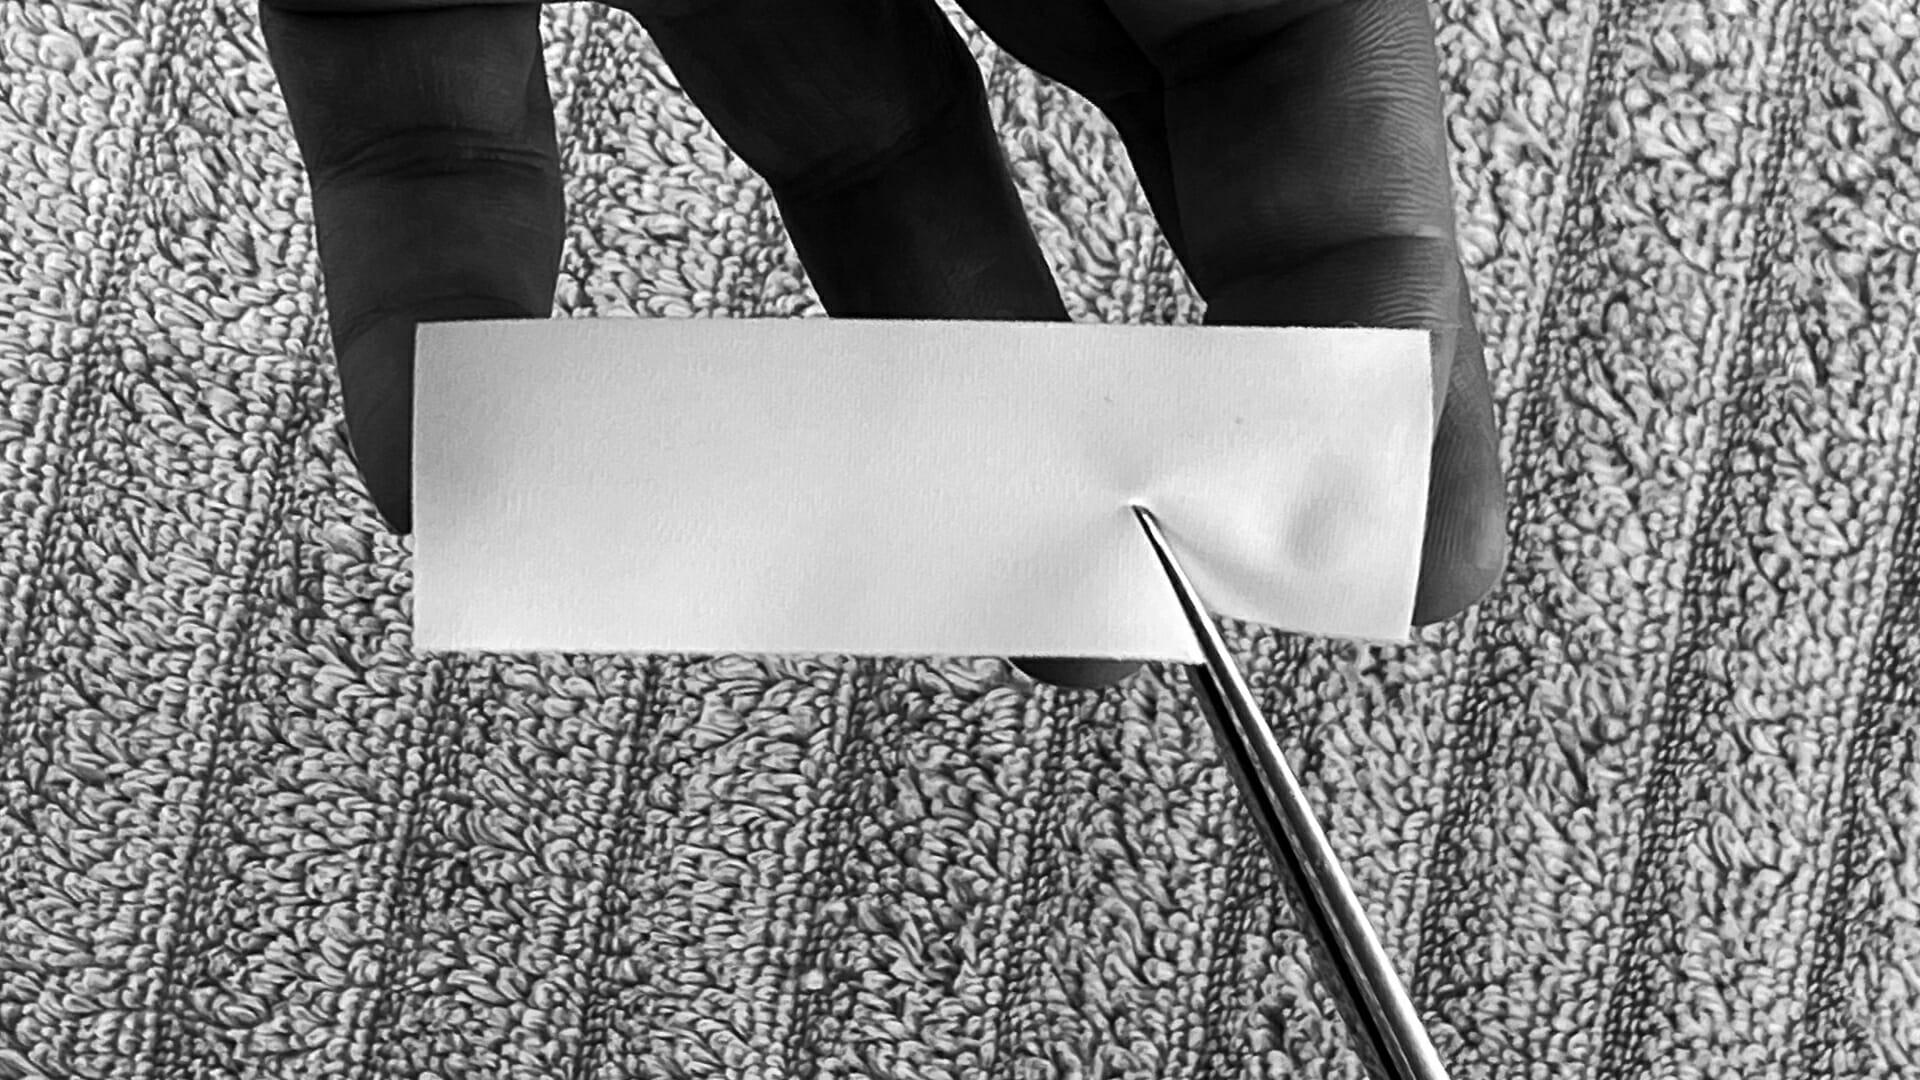 cut cross brace at 45 degree angle